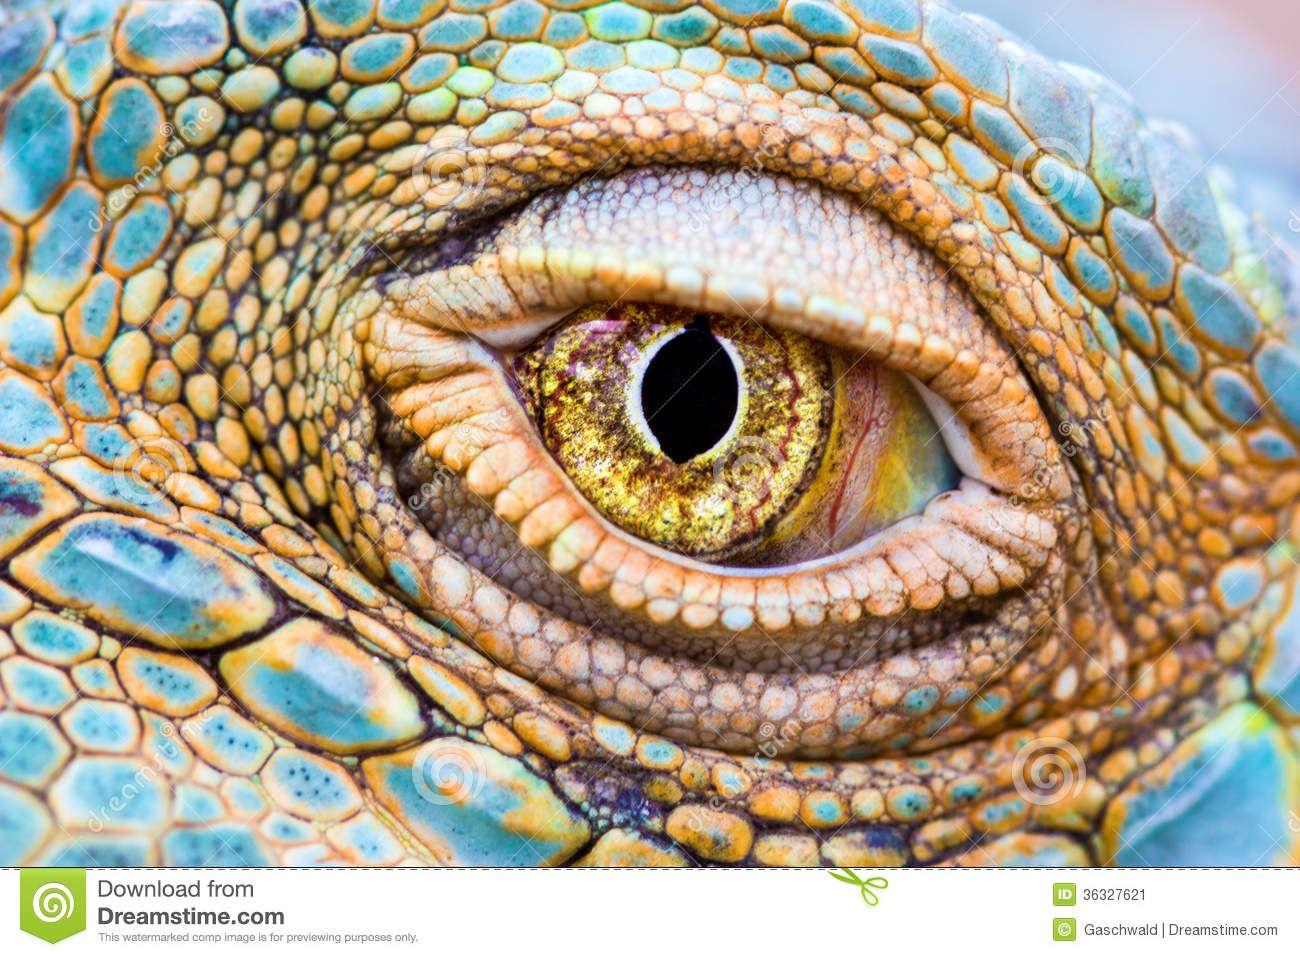 pix for reptile eyes close up eyes pinterest. Black Bedroom Furniture Sets. Home Design Ideas